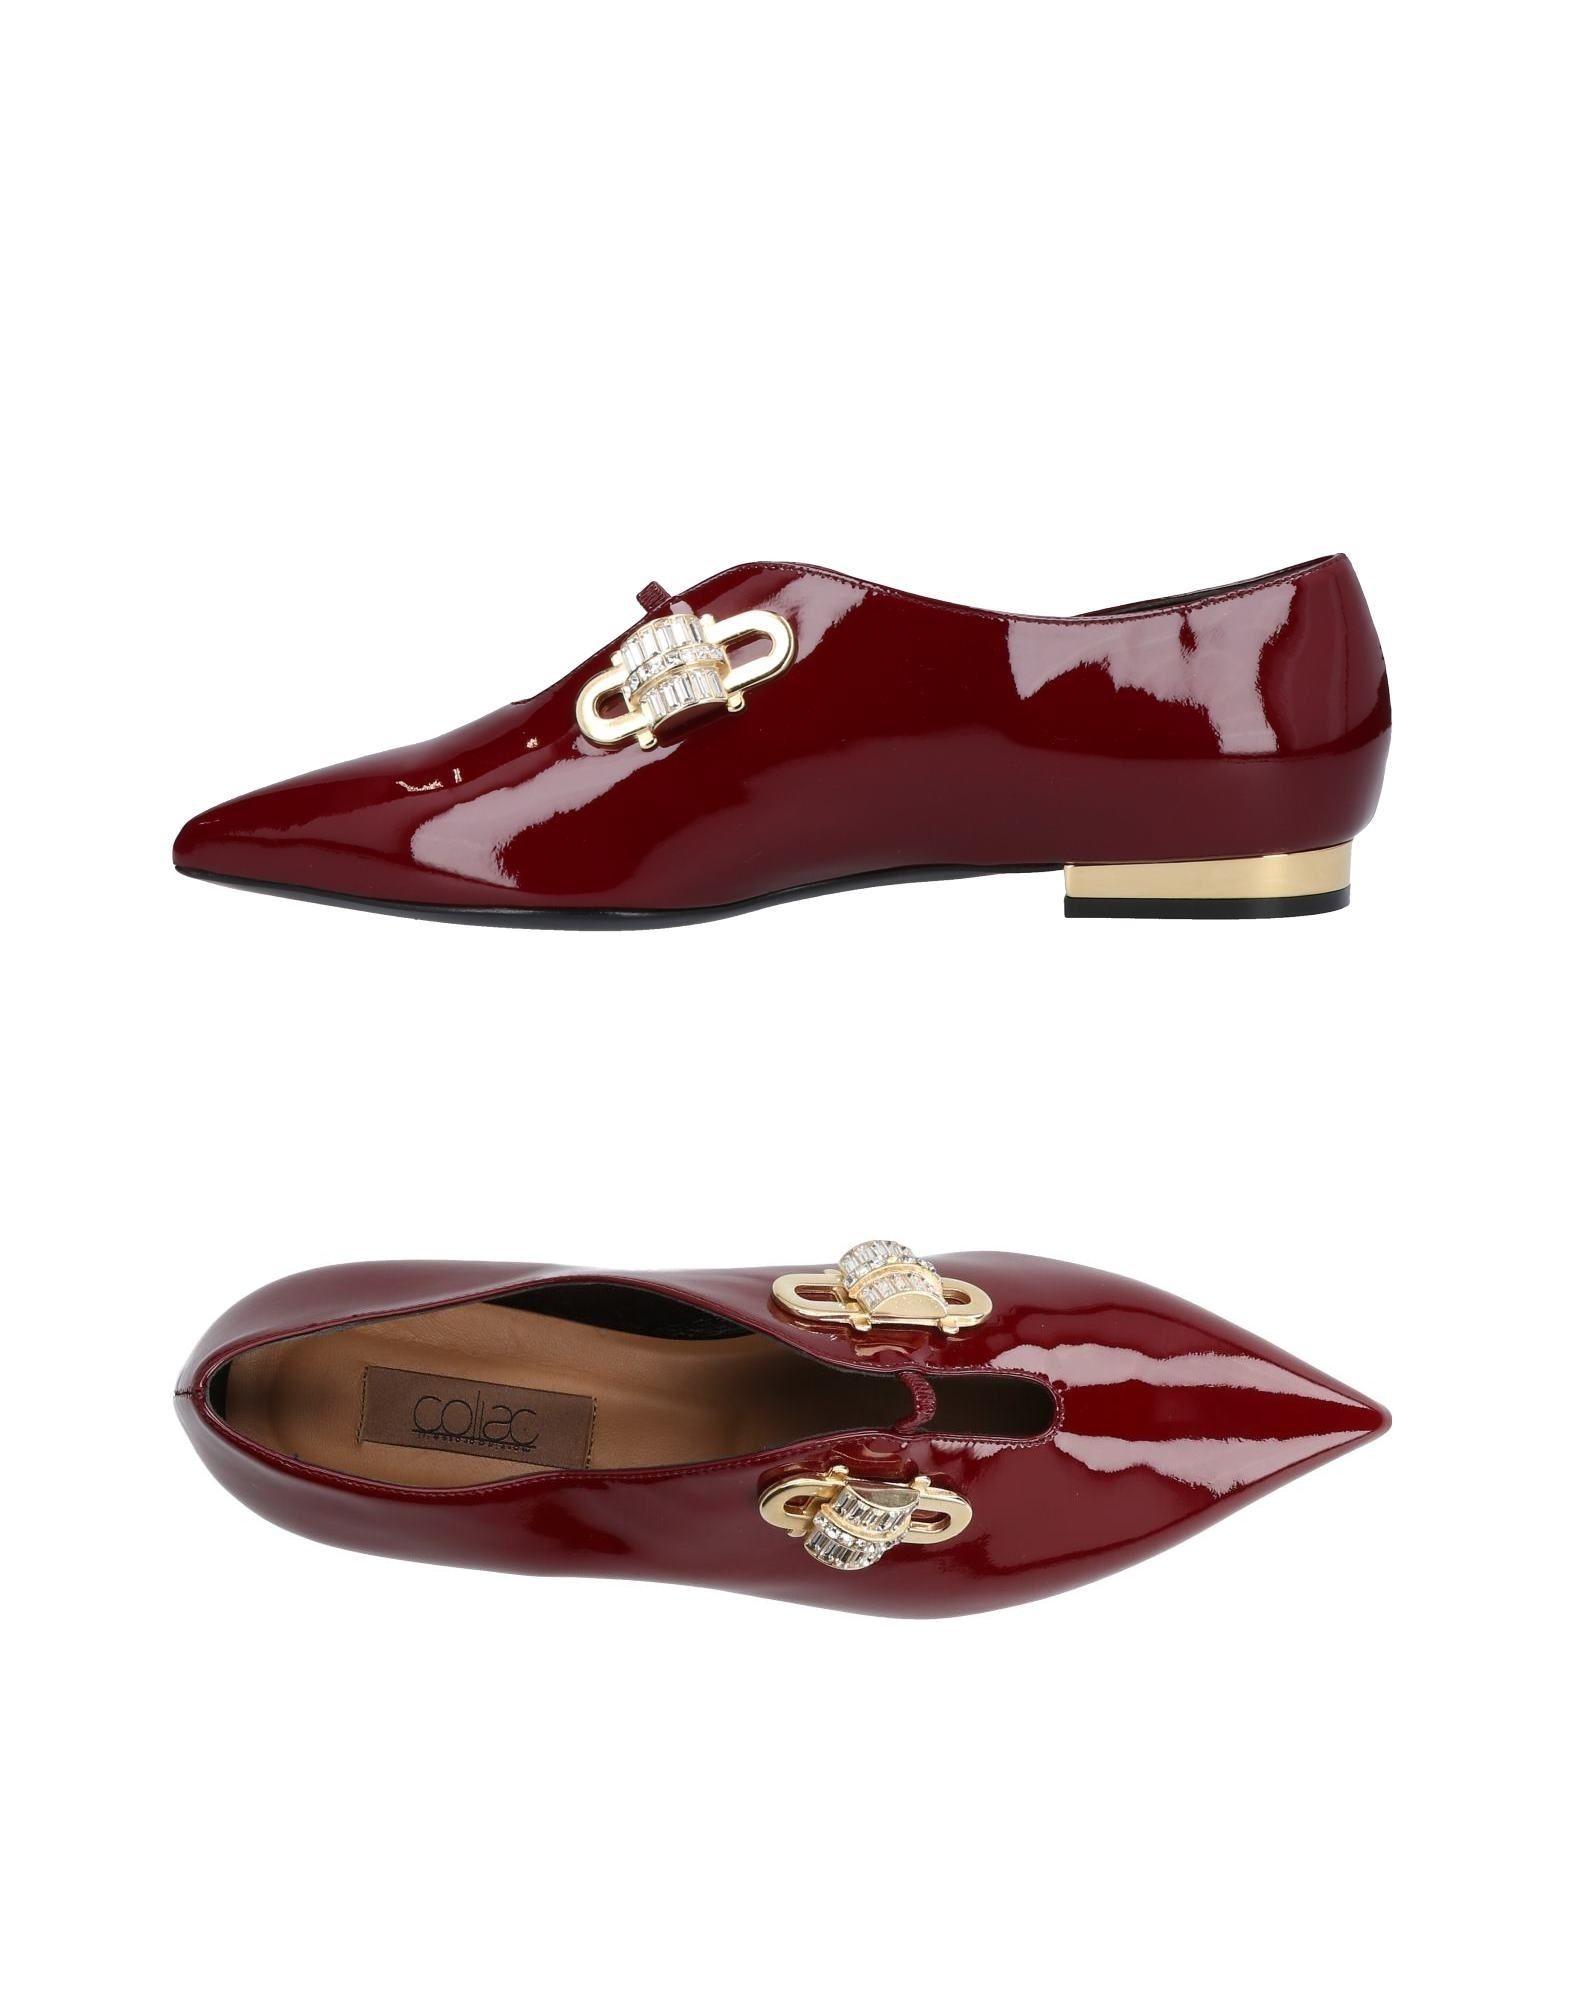 Coliac Martina Grasselli Mokassins Damen Damen Damen  11452398JO Neue Schuhe 4b810a